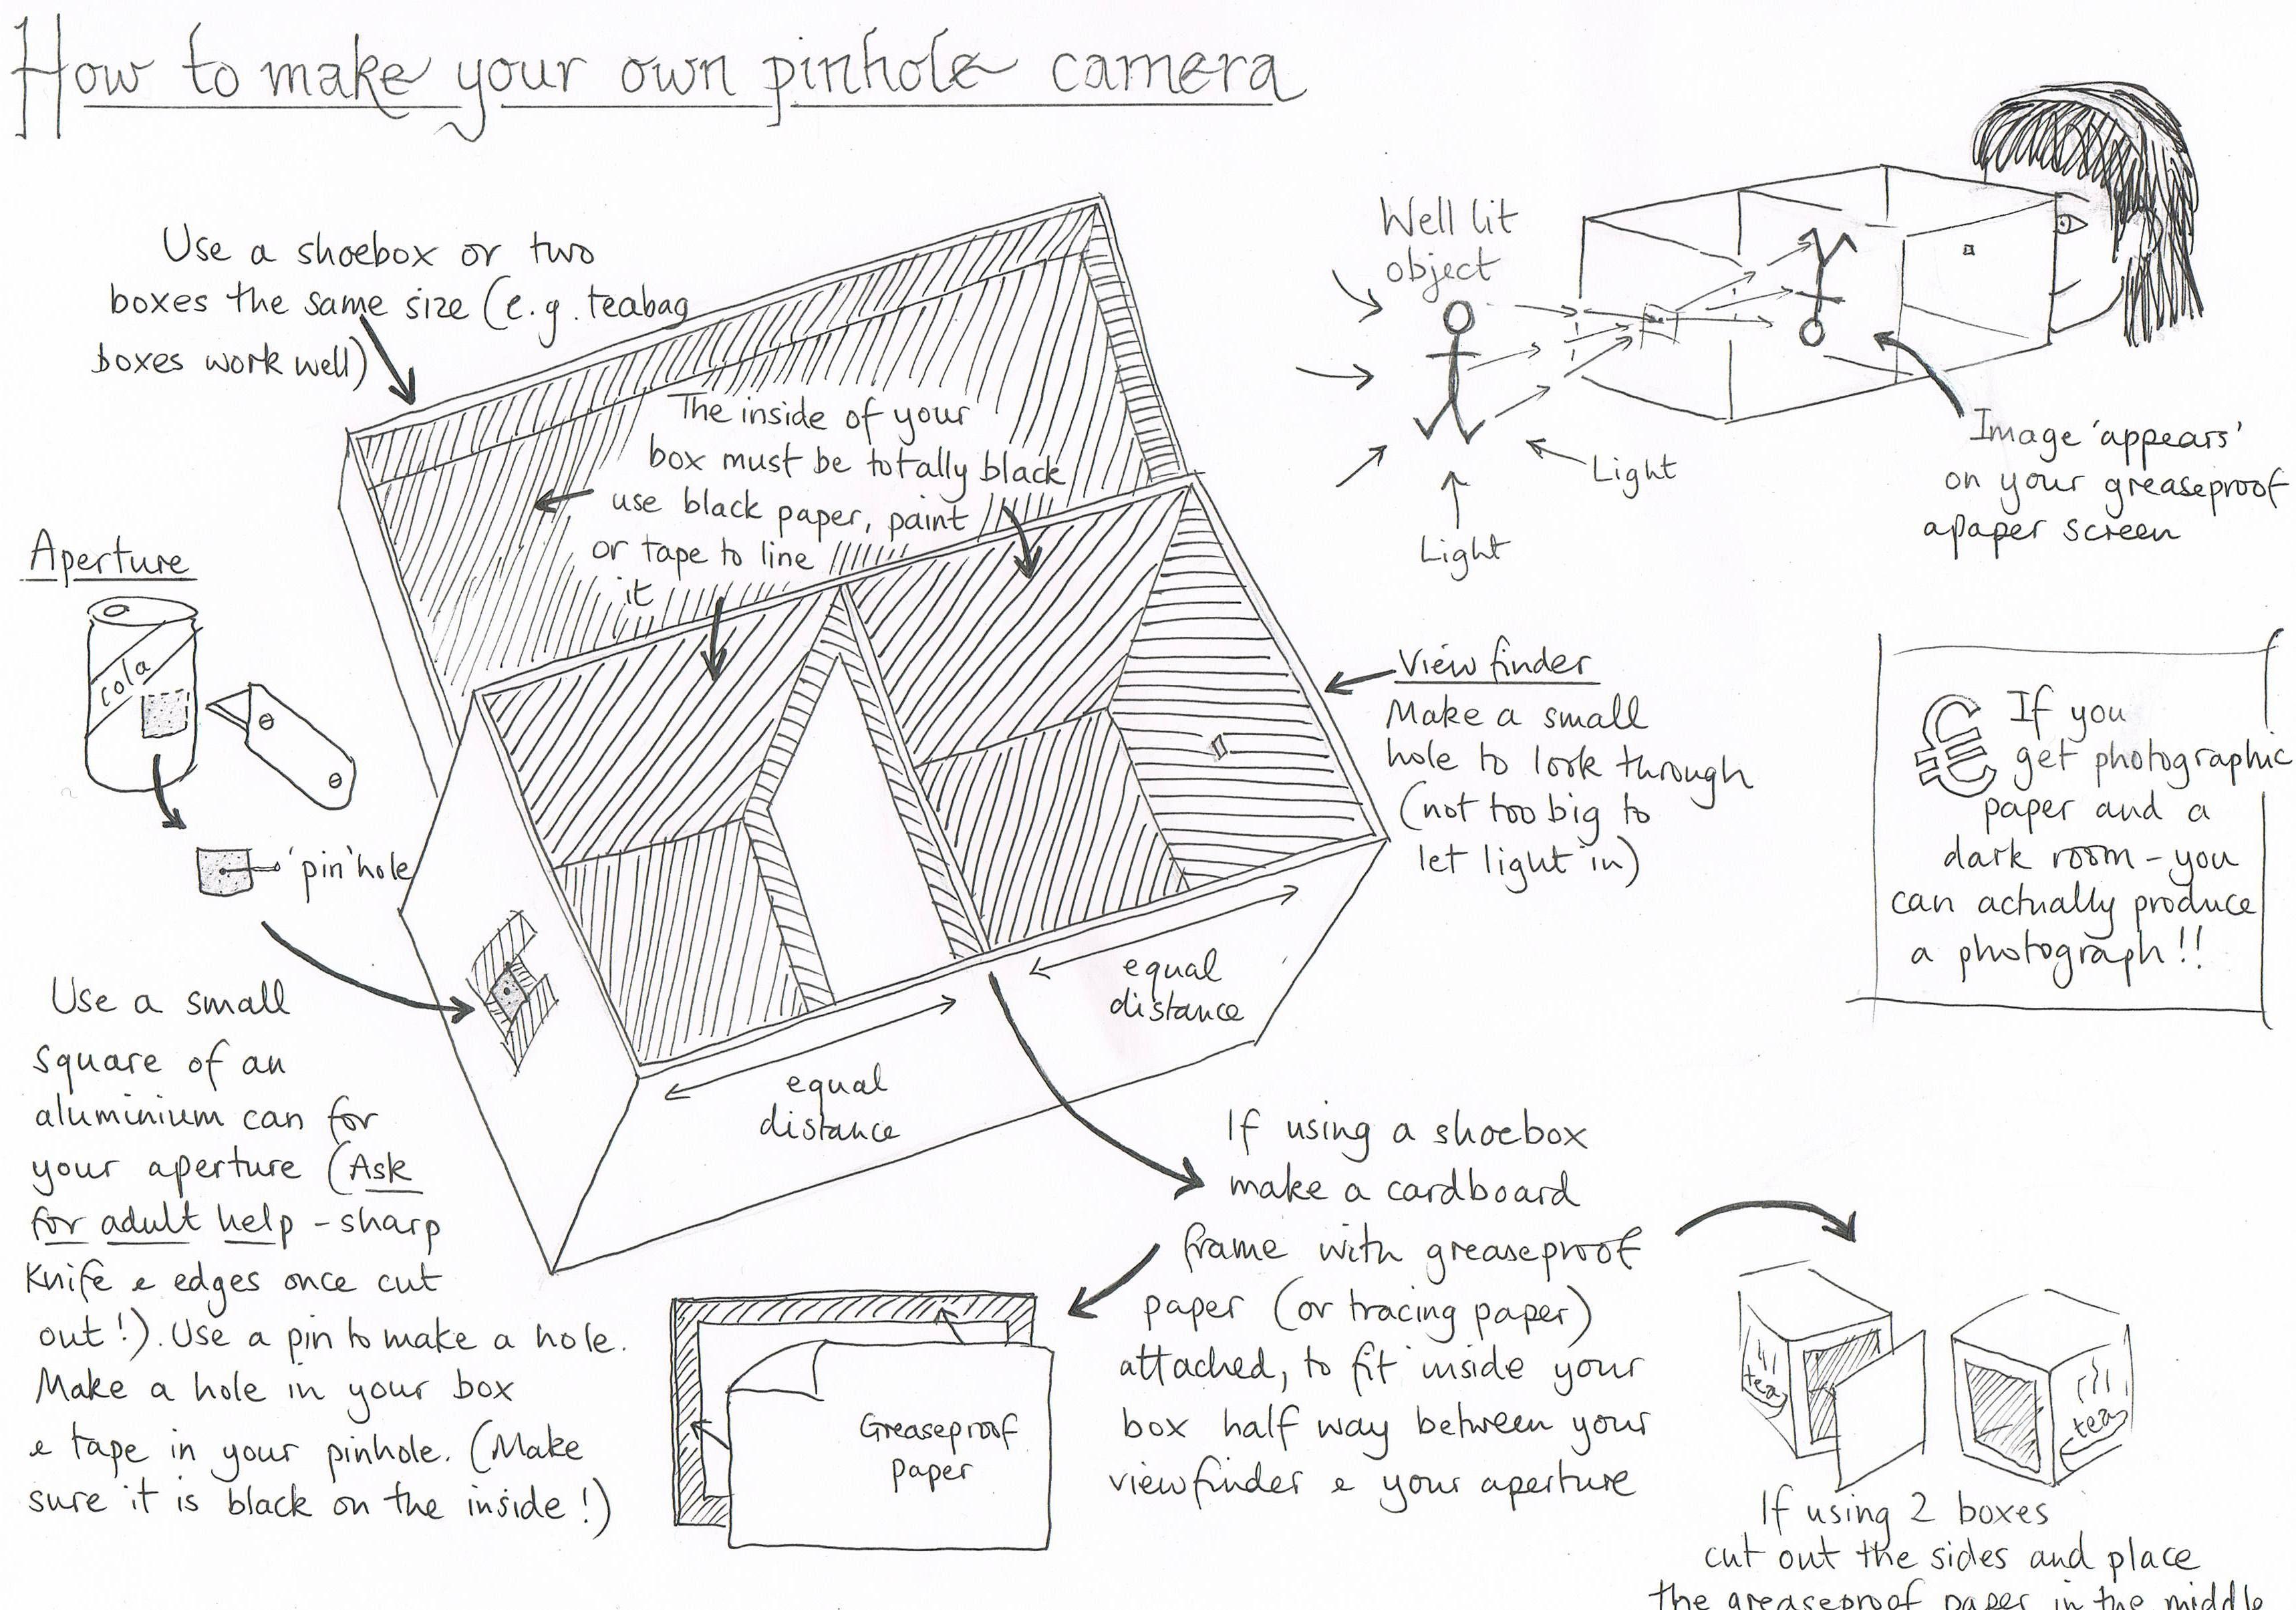 How To Make A Pinhole Camera  By Julie Burke  Our